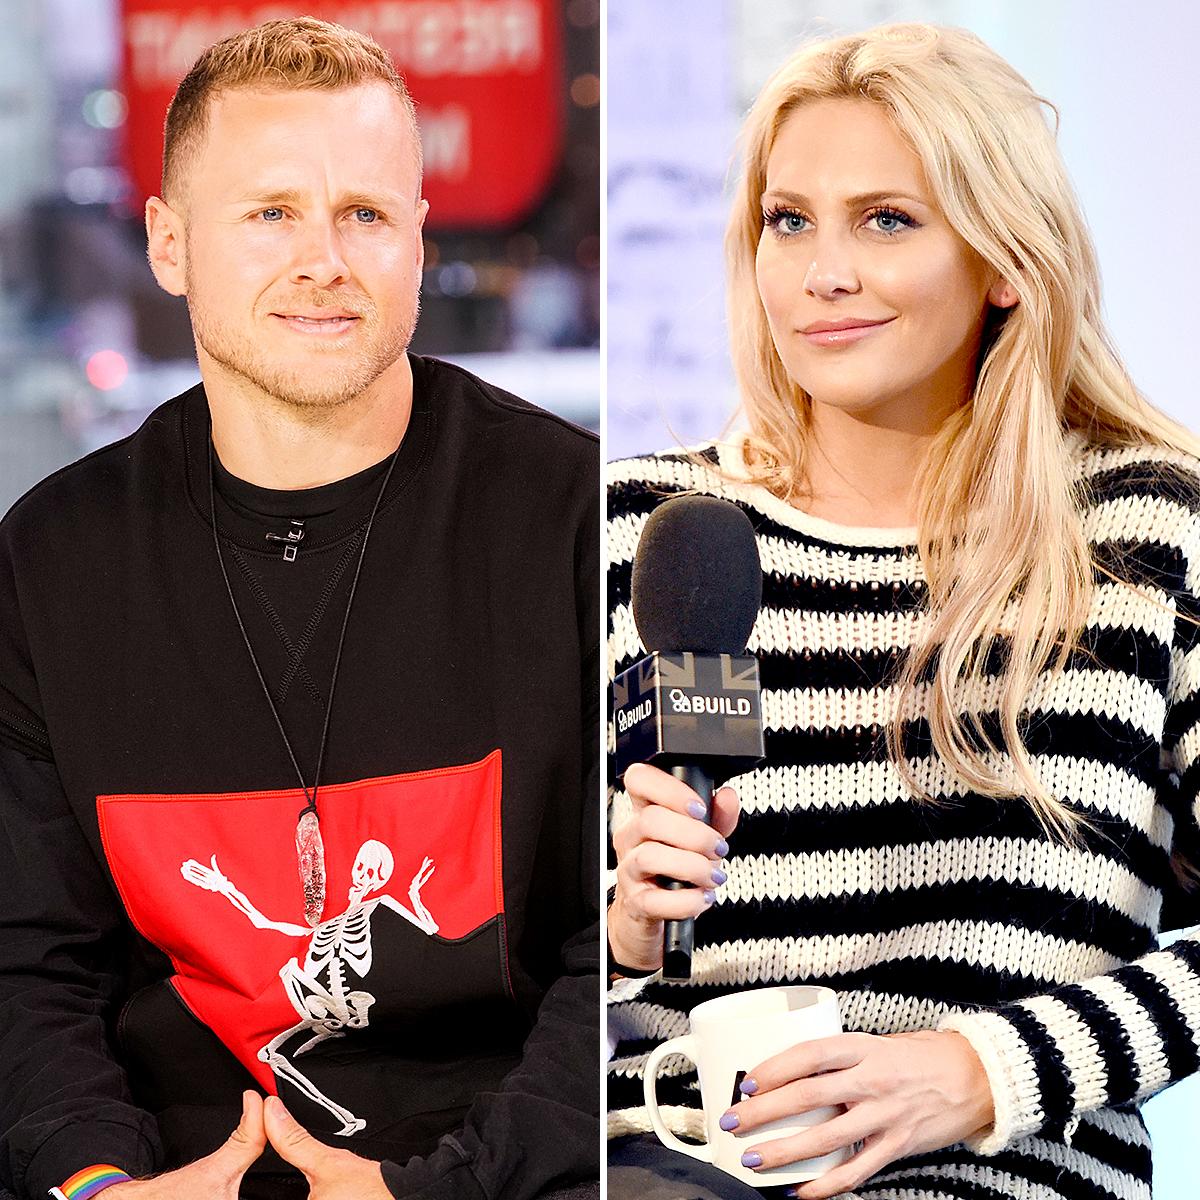 Spencer-Pratt-and-Stephanie-Pratt's-Sibling-Drama - NEW YORK, NY – FEBRUARY 26: Spencer Pratt attends MTV TRL at MTV Studios on February 26, 2018 in New York City. (Photo by MTV/TRL/Getty Images)